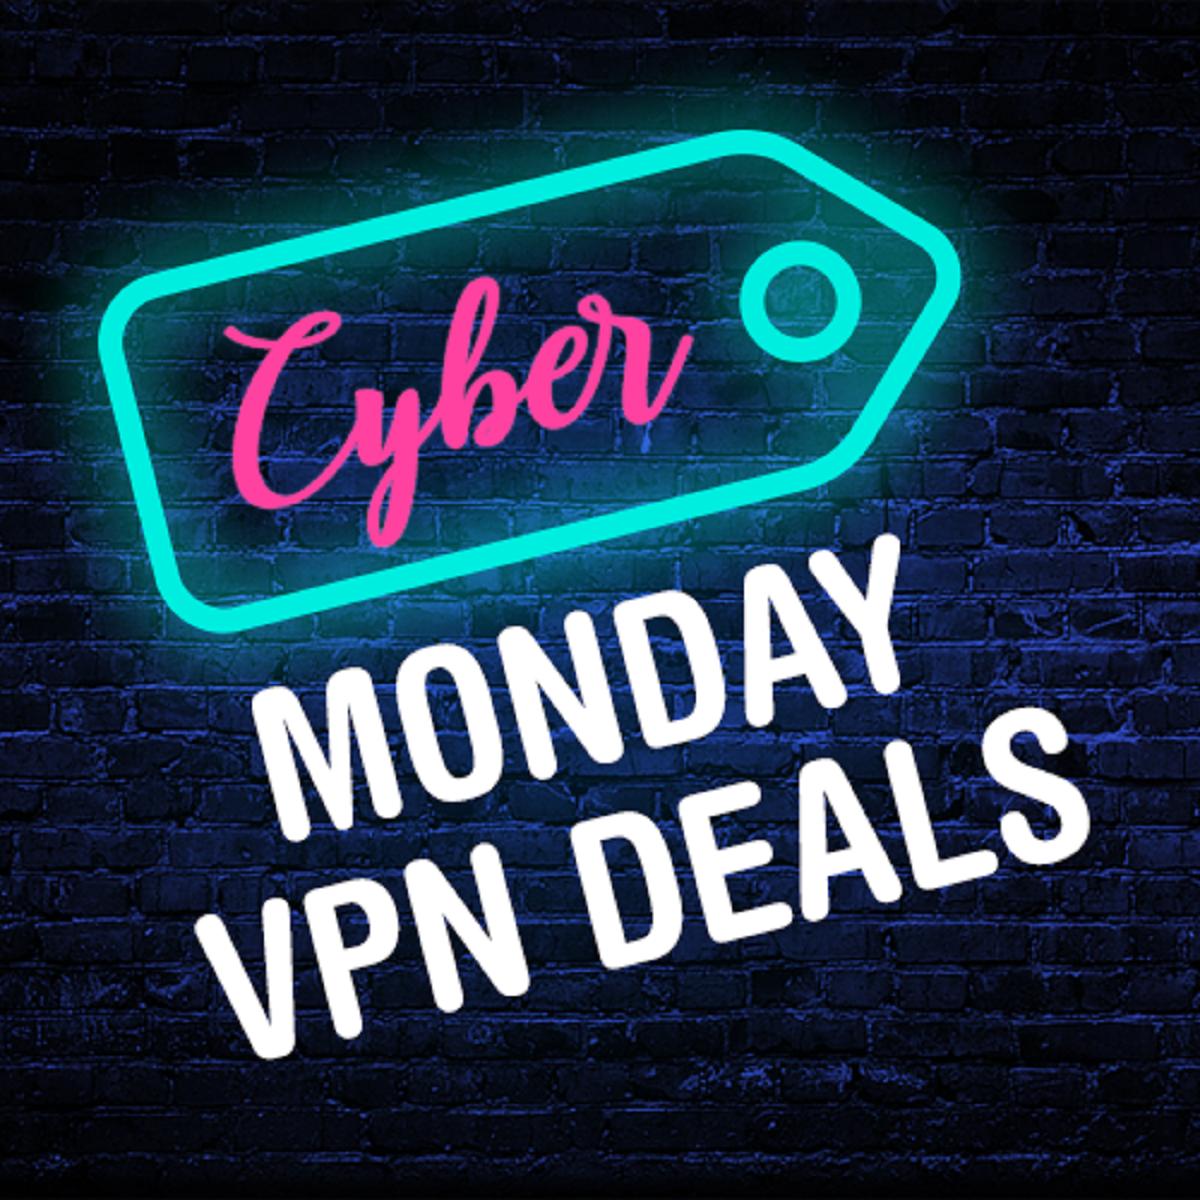 Cyber Monday Deals For Vpn Bargain Hunters